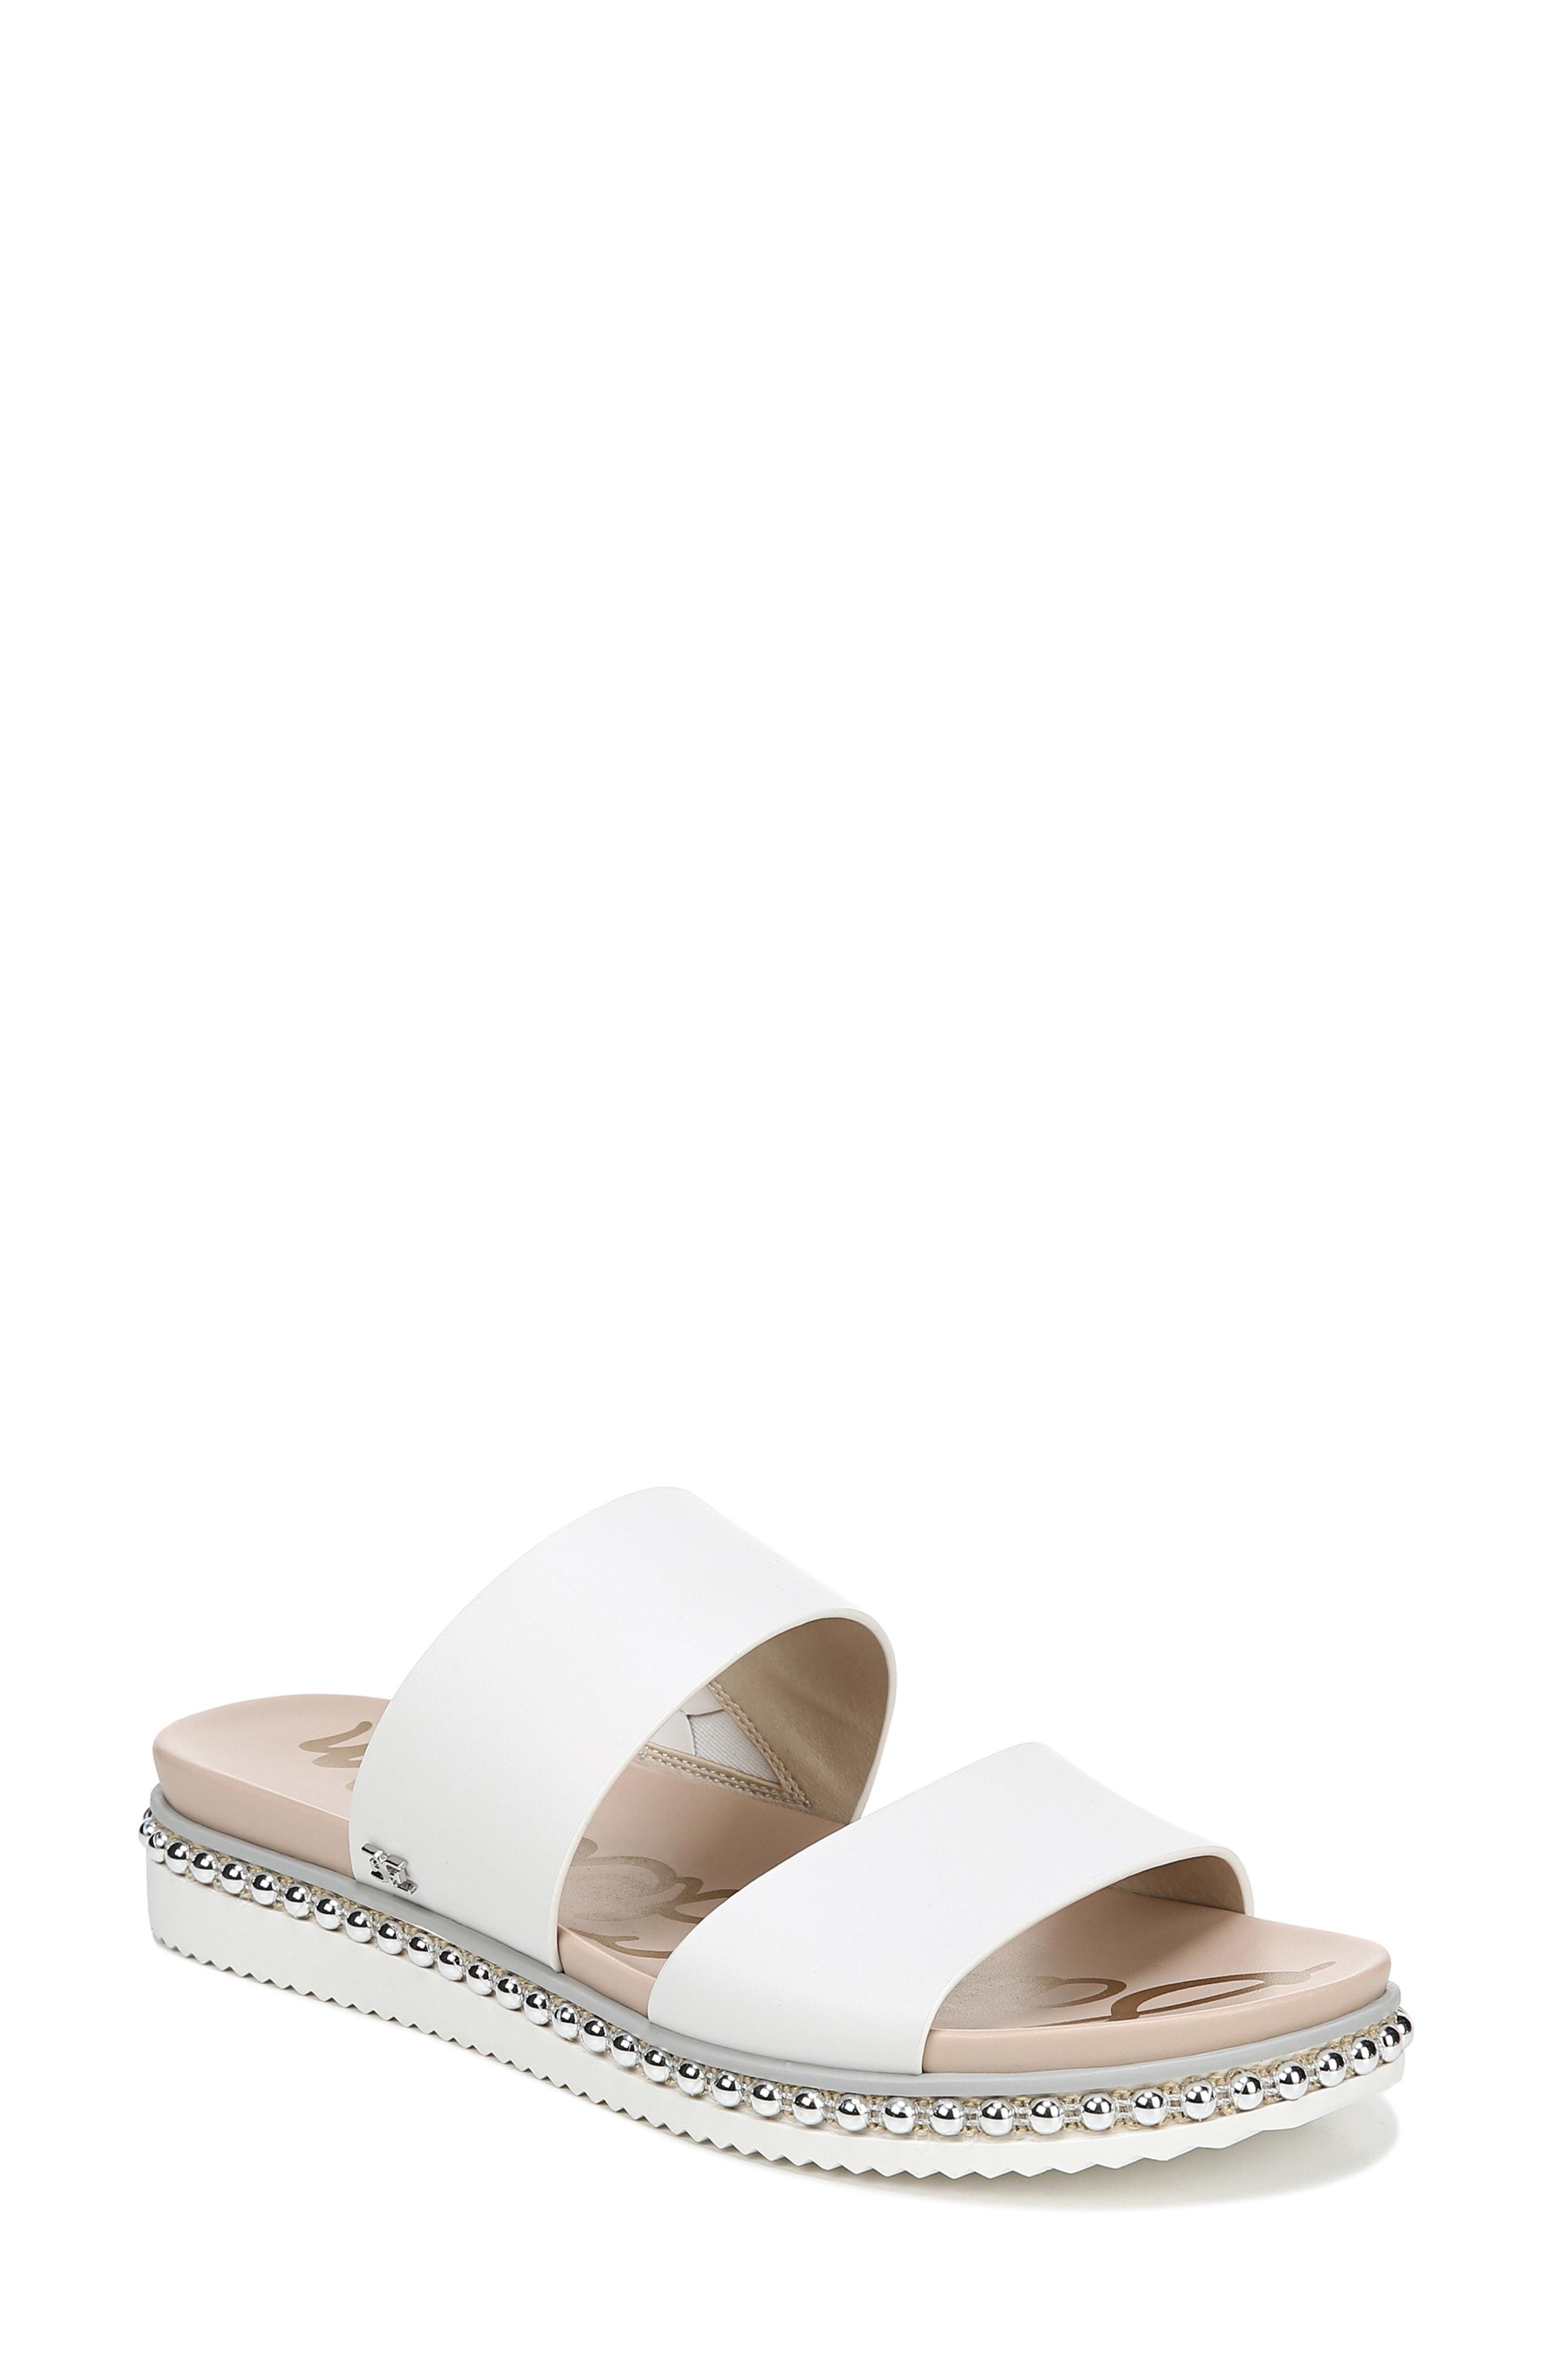 1d4574ef997fb9 Lyst - Sam Edelman Women s Asha Leather Slides - White - Size 7 ...